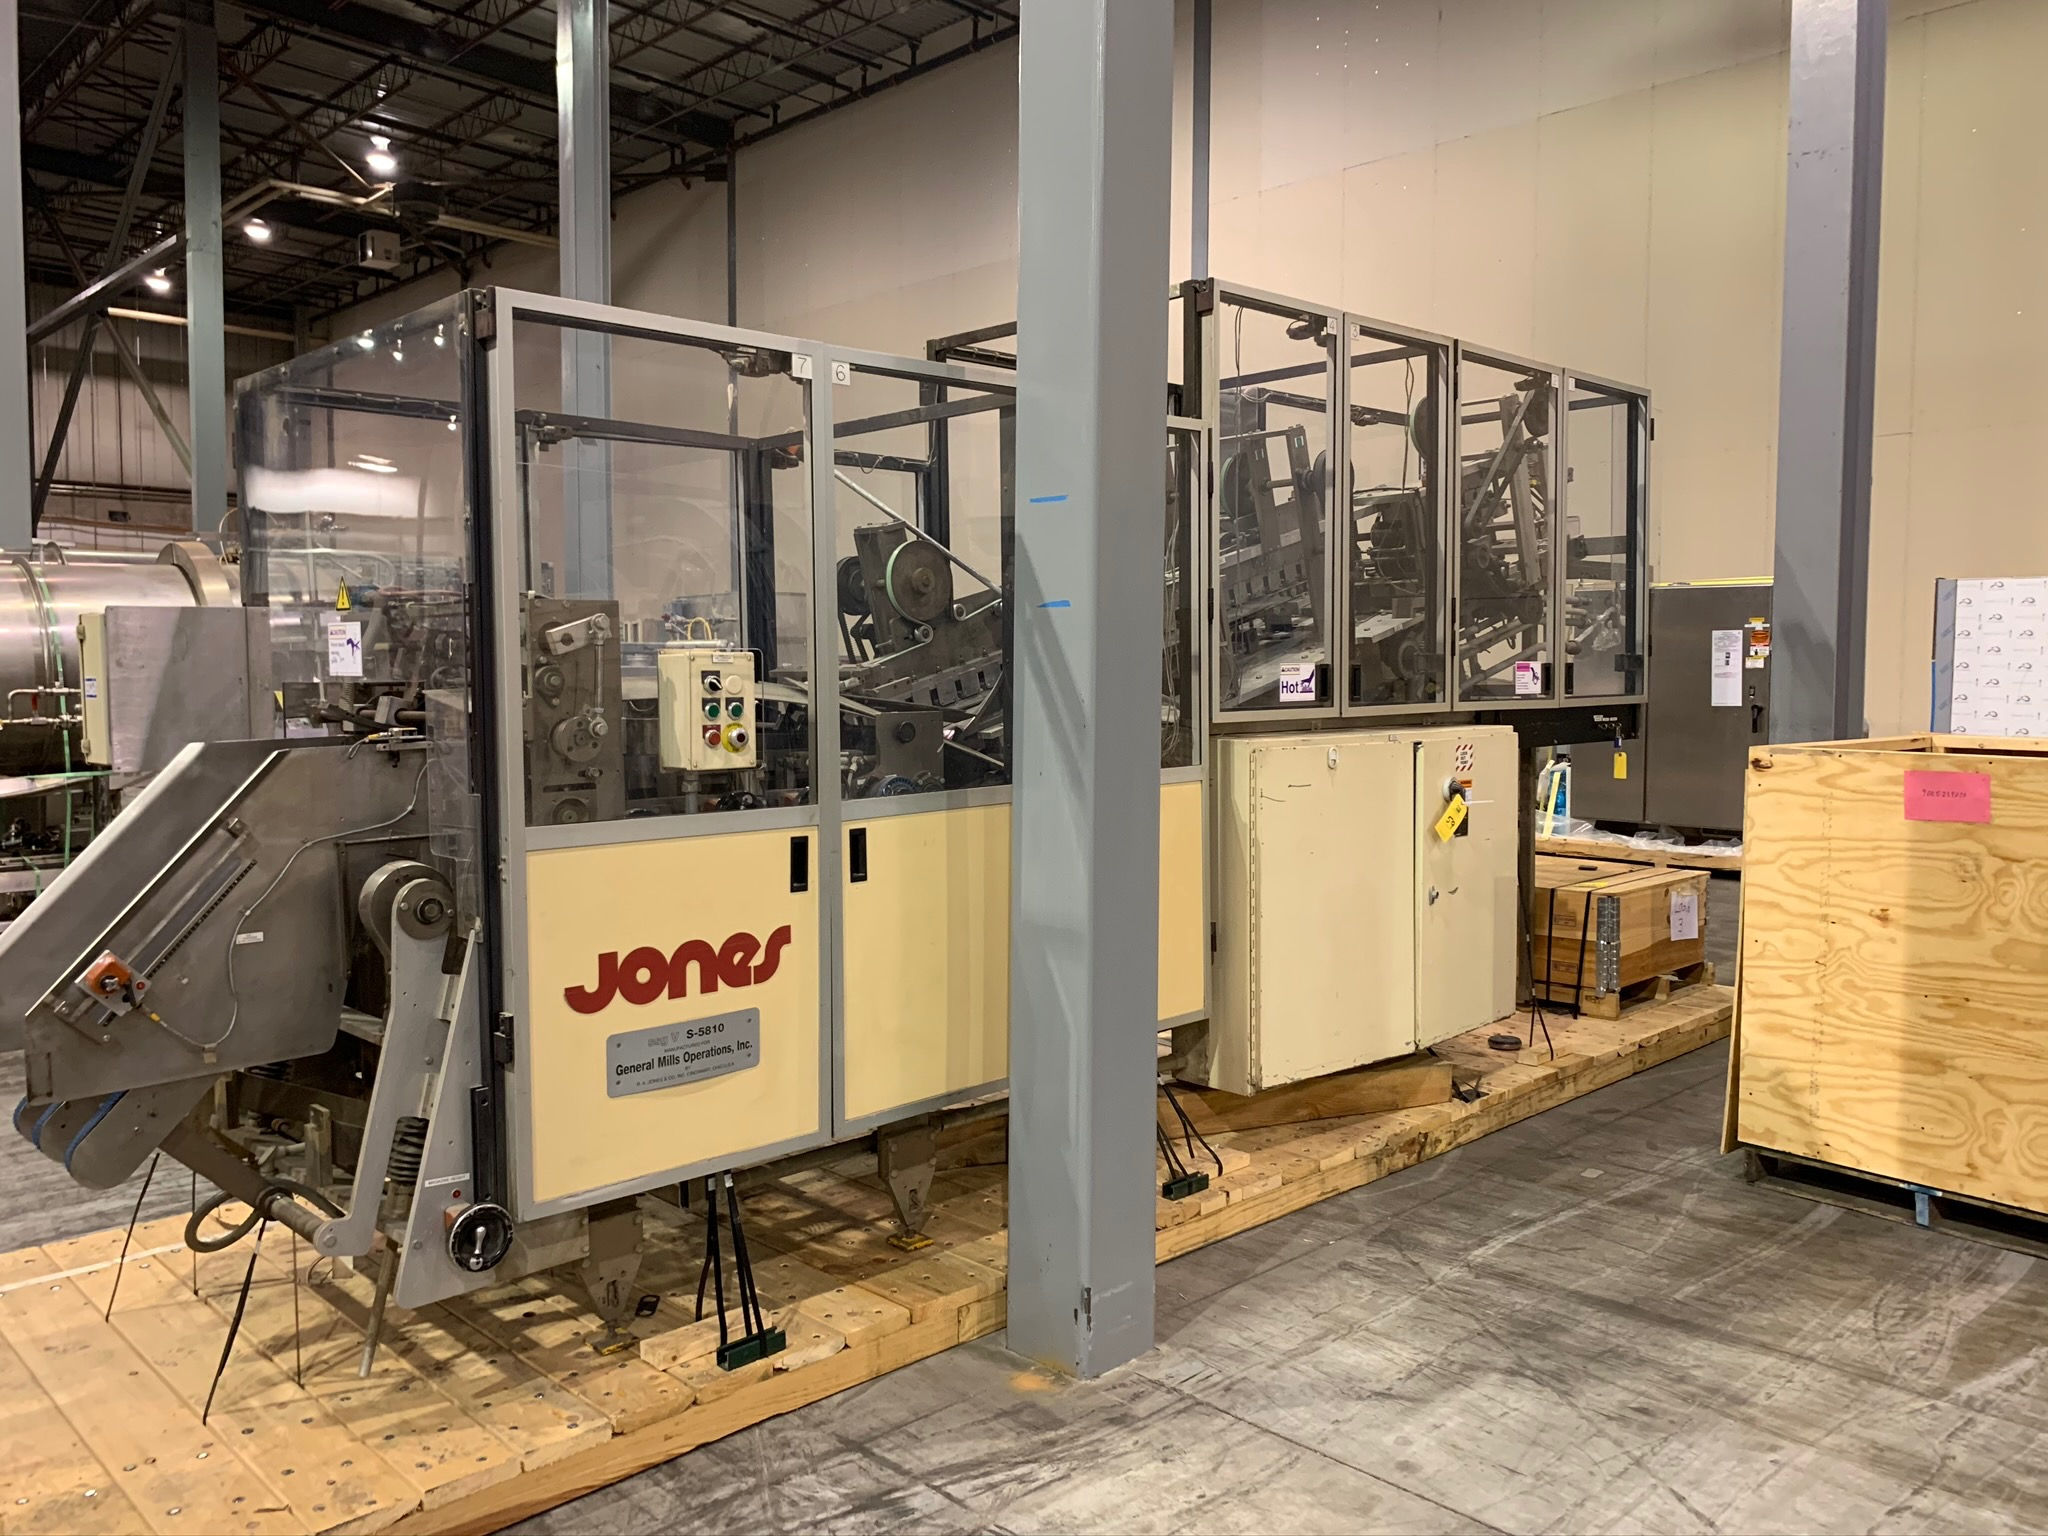 Jones Centurion Side Seam Gluer S/N S-5810 (Rigging Fee - $250) - Image 2 of 8